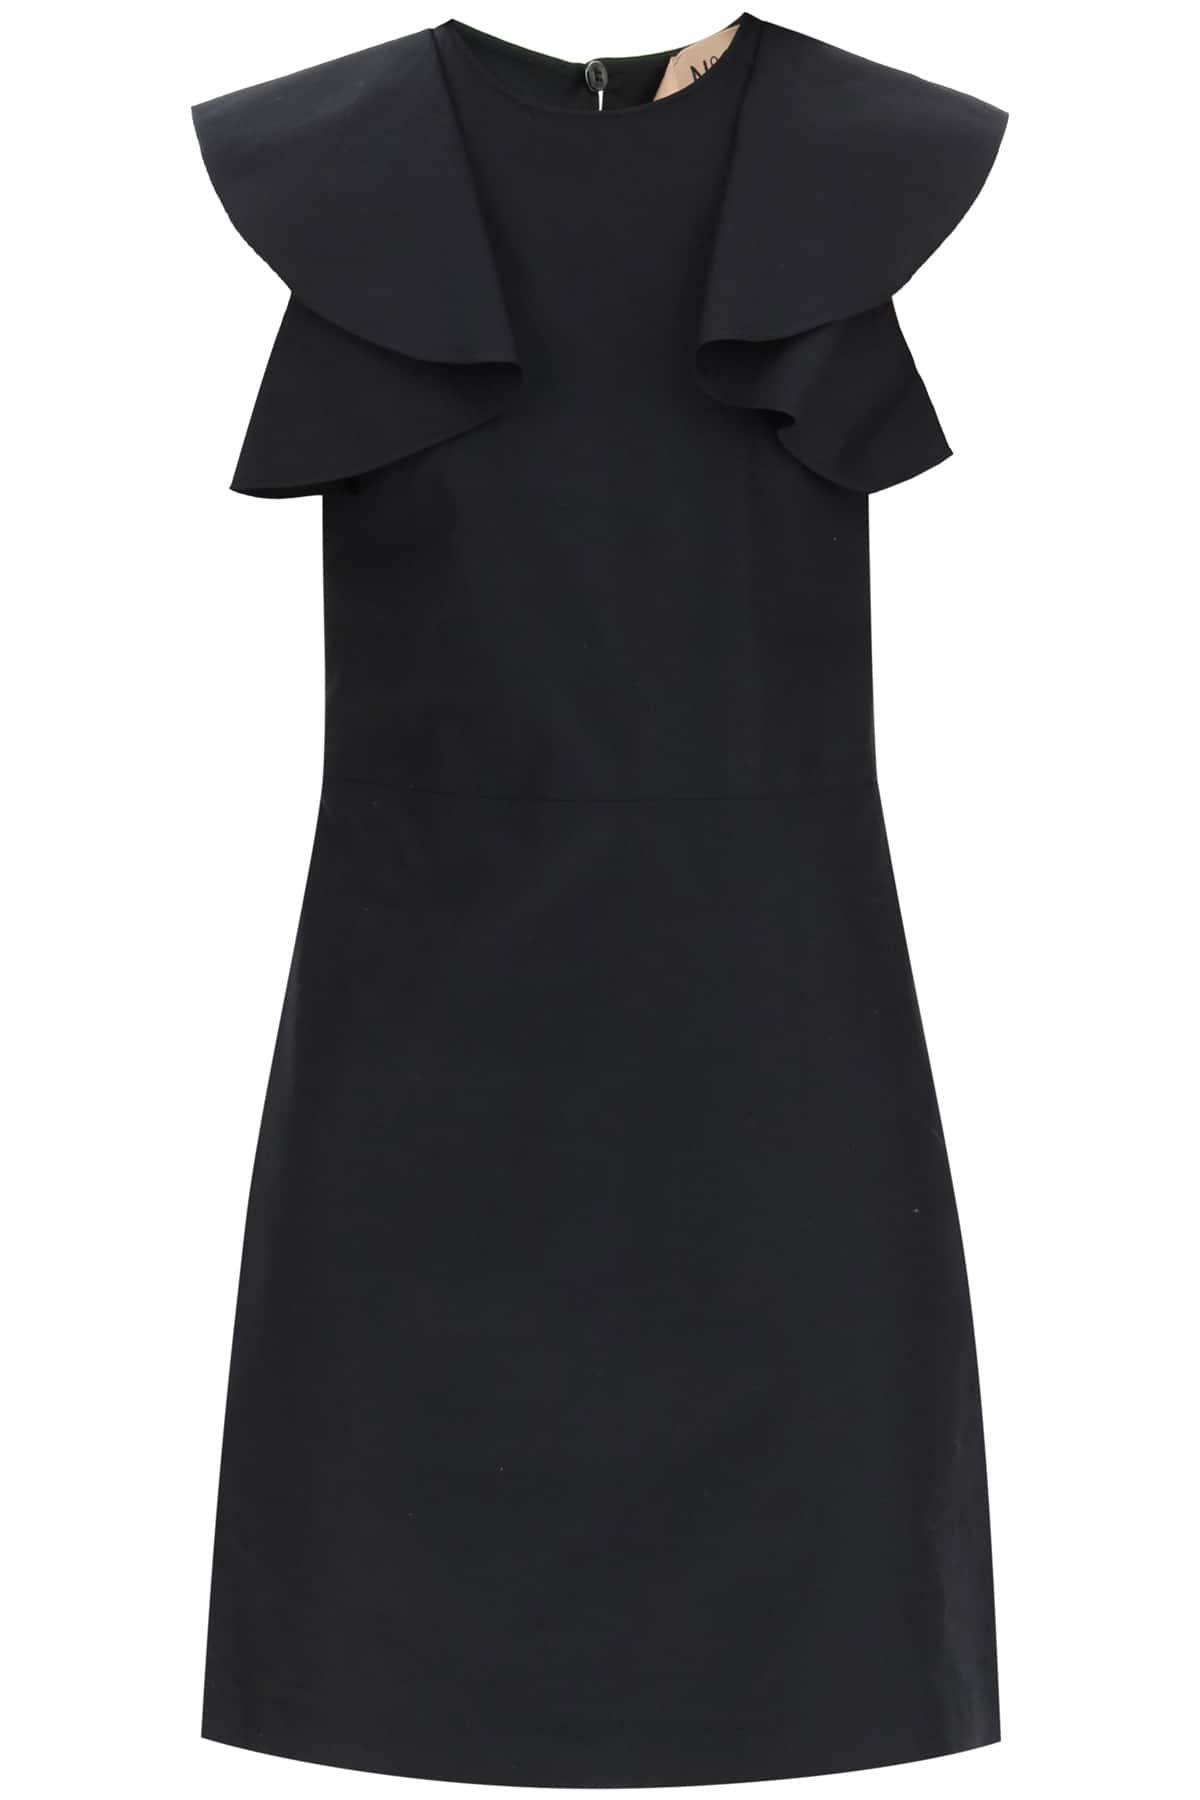 N.21 COTTON MINI DRESS WITH RUFFLES 40 Black Cotton